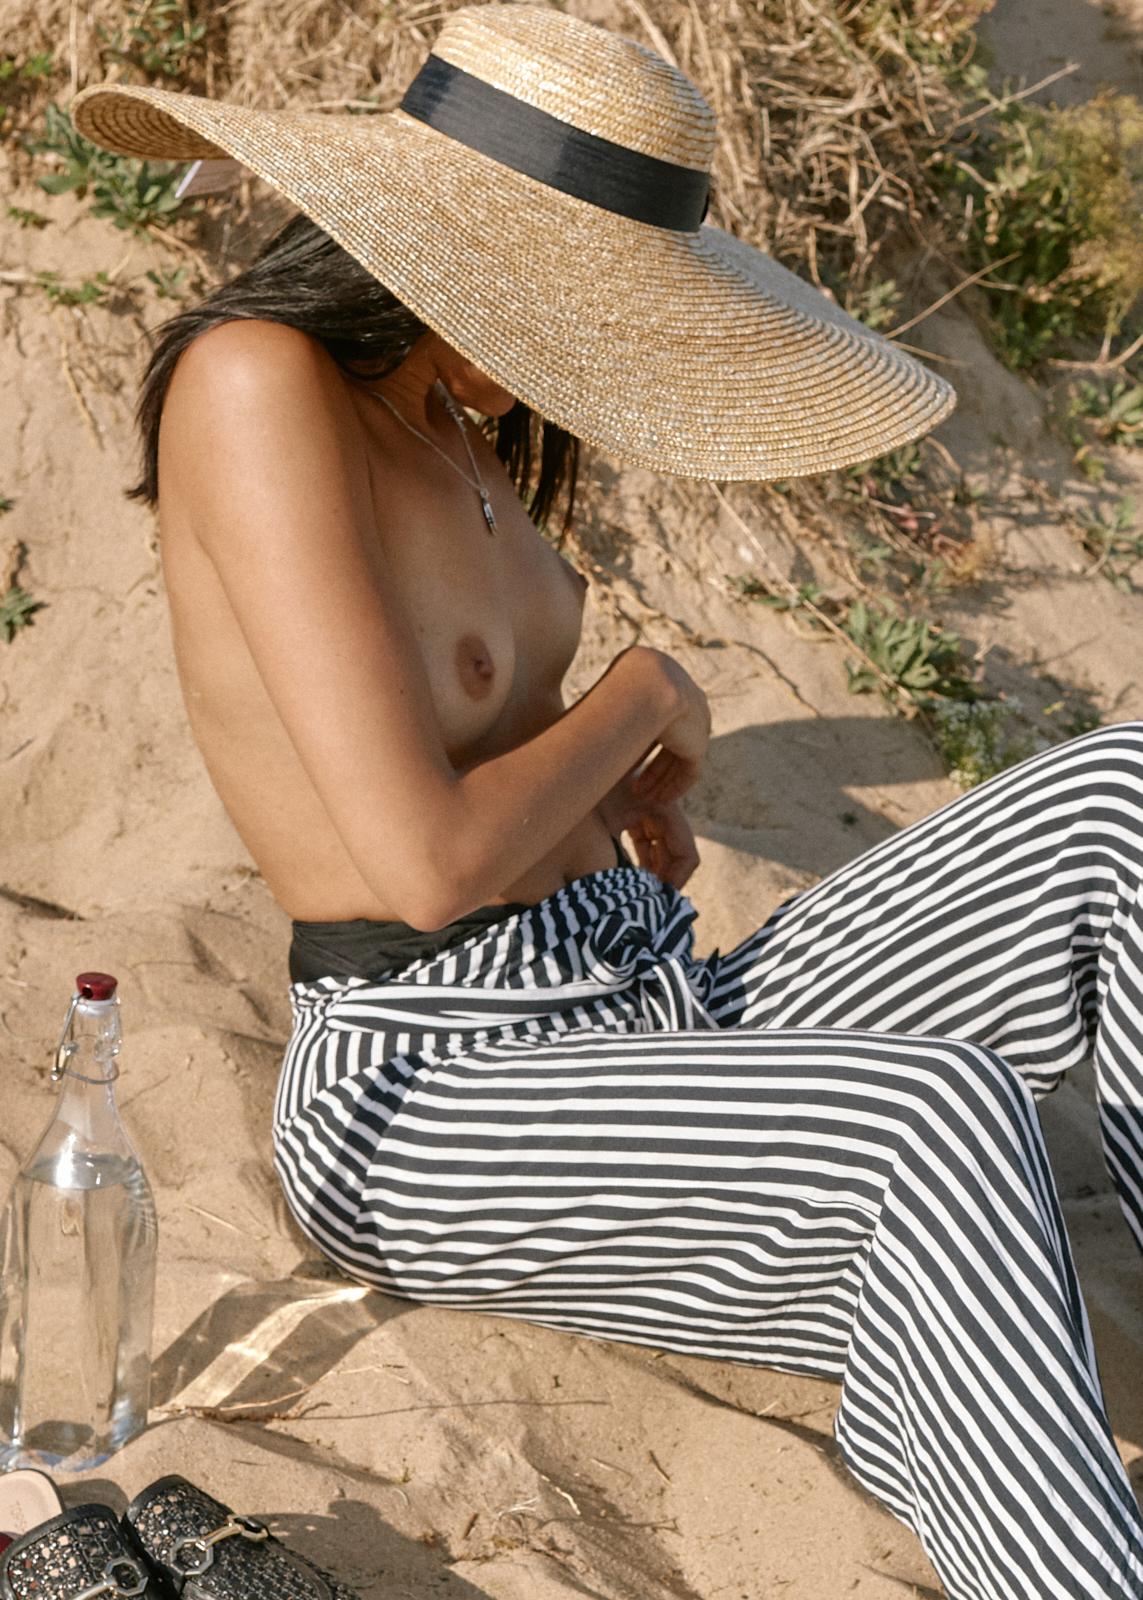 Sophie A Beach - June 2018 - 0221 web.jpg